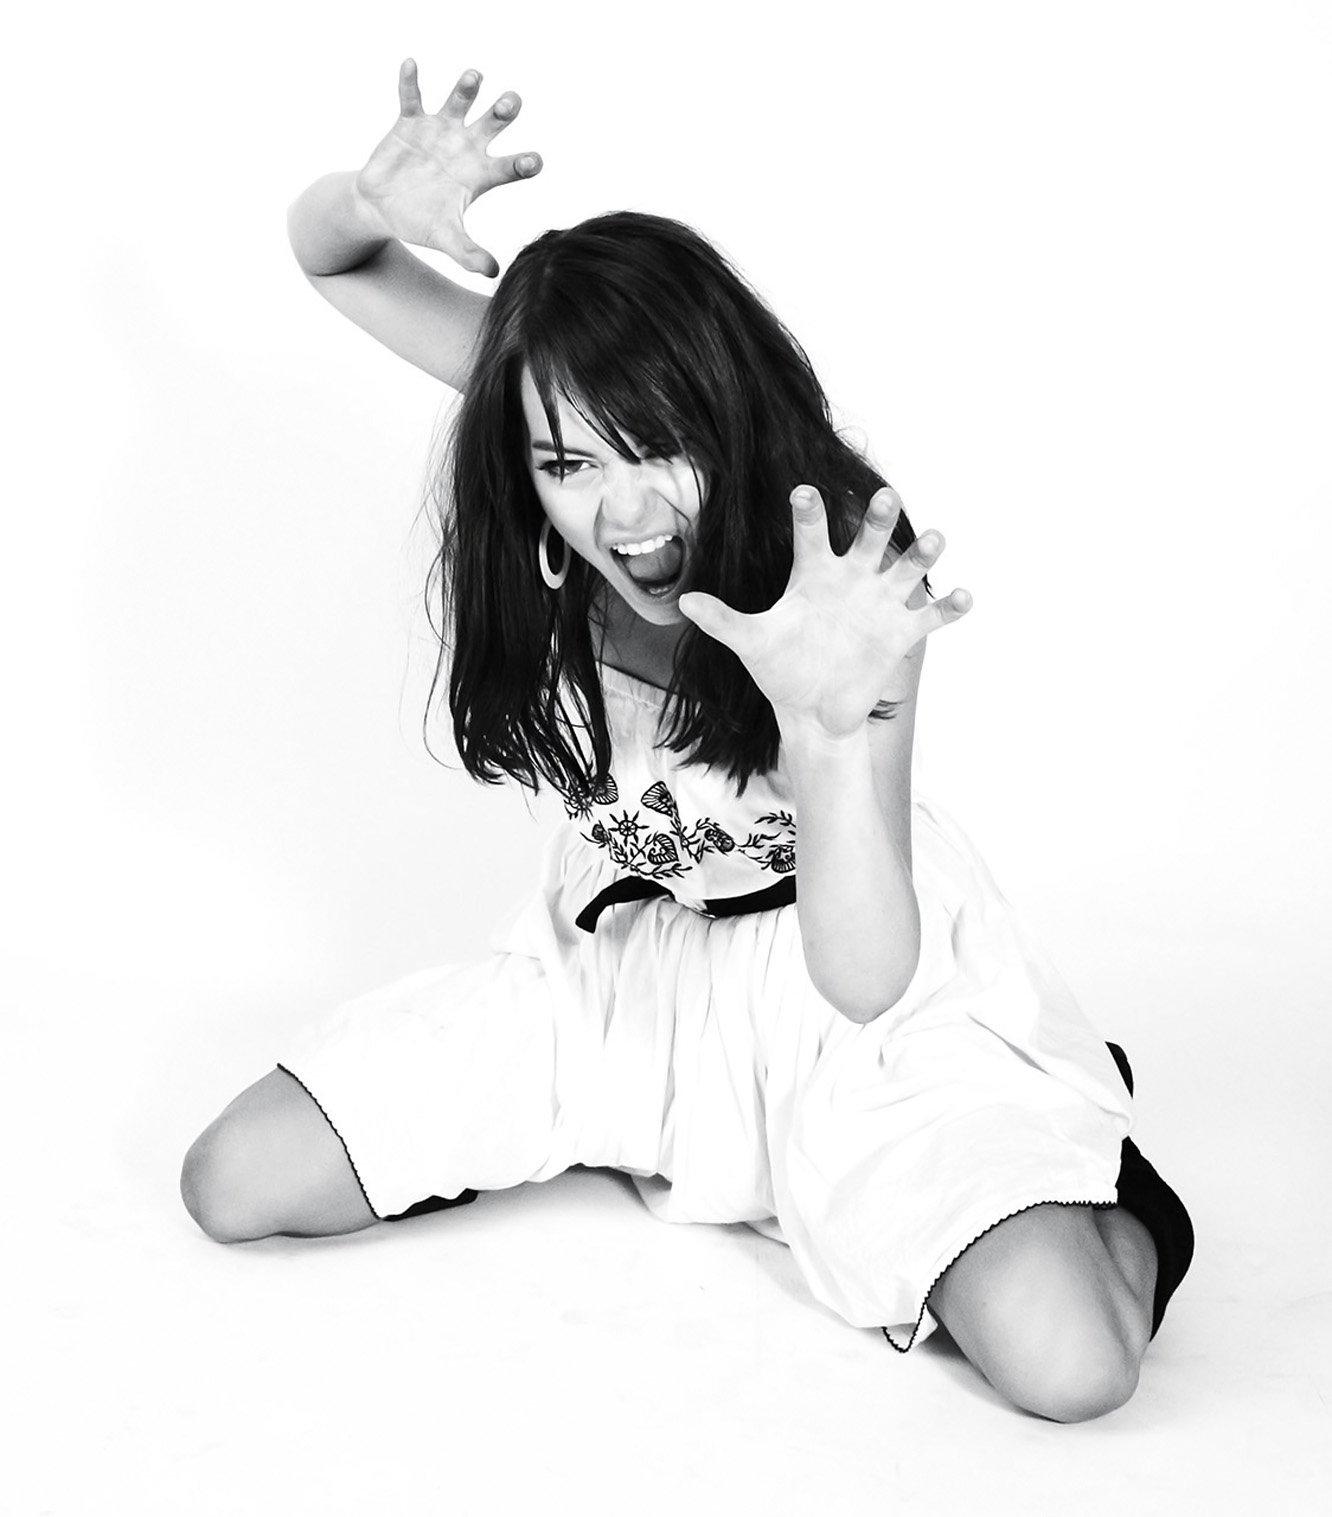 Emma Stone Sexy And Fun Photo Shoot